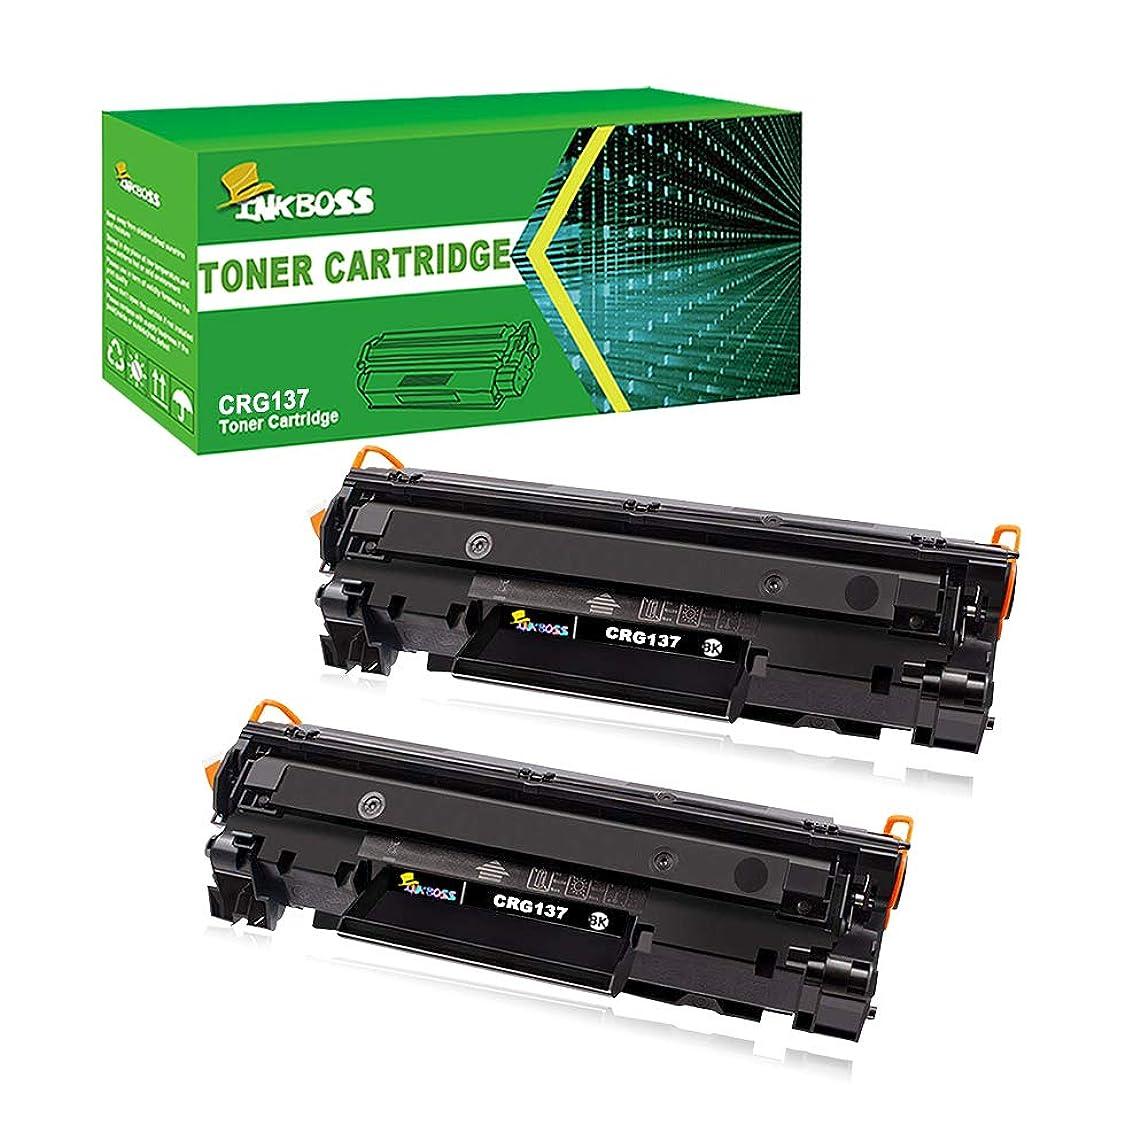 INKBOSS 2 Packs Compatible Toner Cartridge Replacement for Canon Cartridge 137 Starter Toner Cartridge,High Yield 1,500 pagers (Black) kmkgjom959543